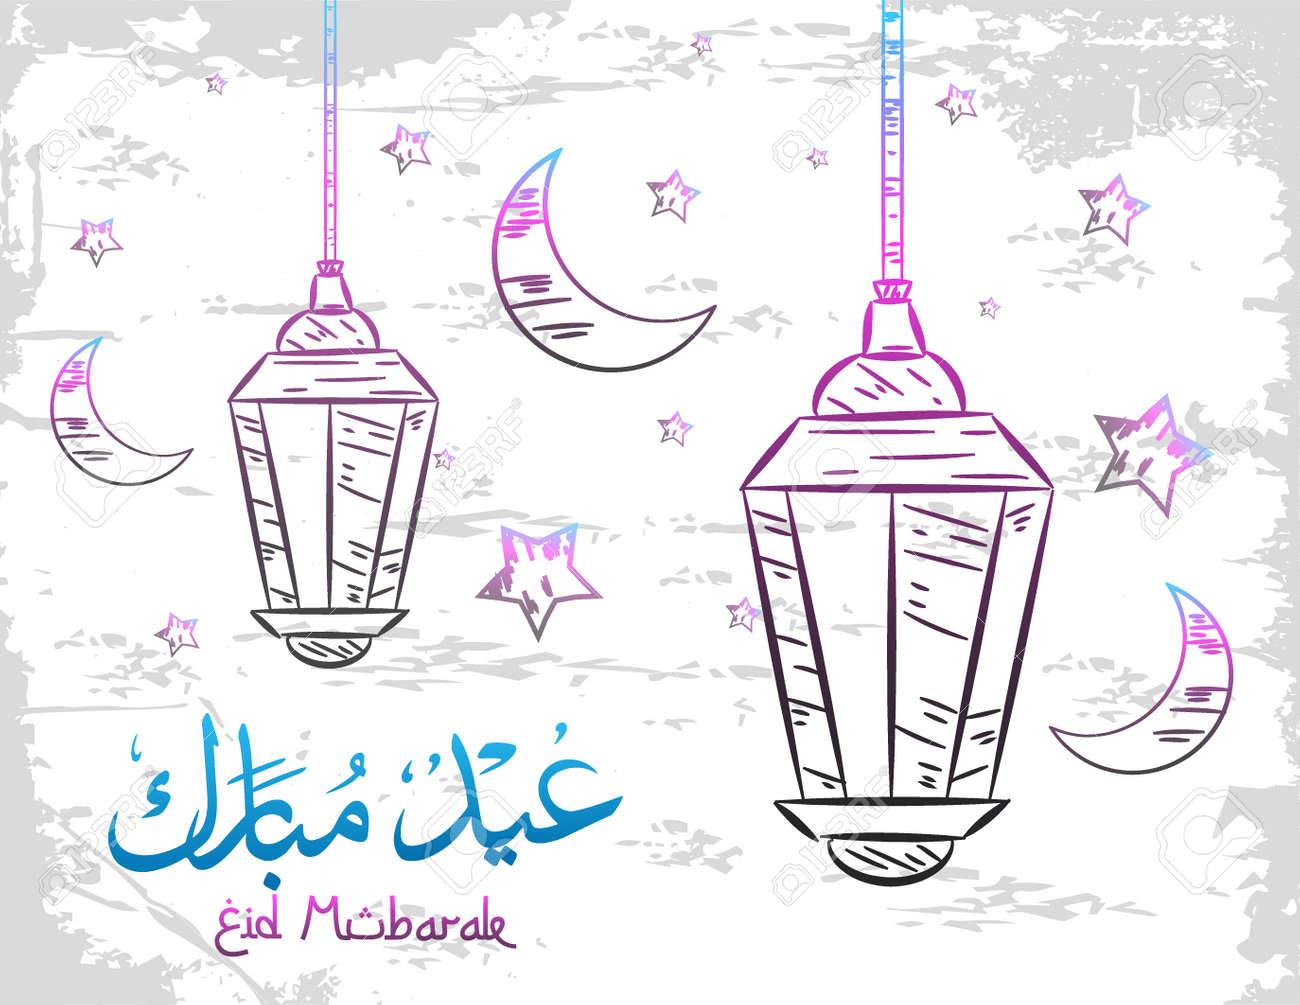 Eid mubarak greeting card on doodle style - 168266530